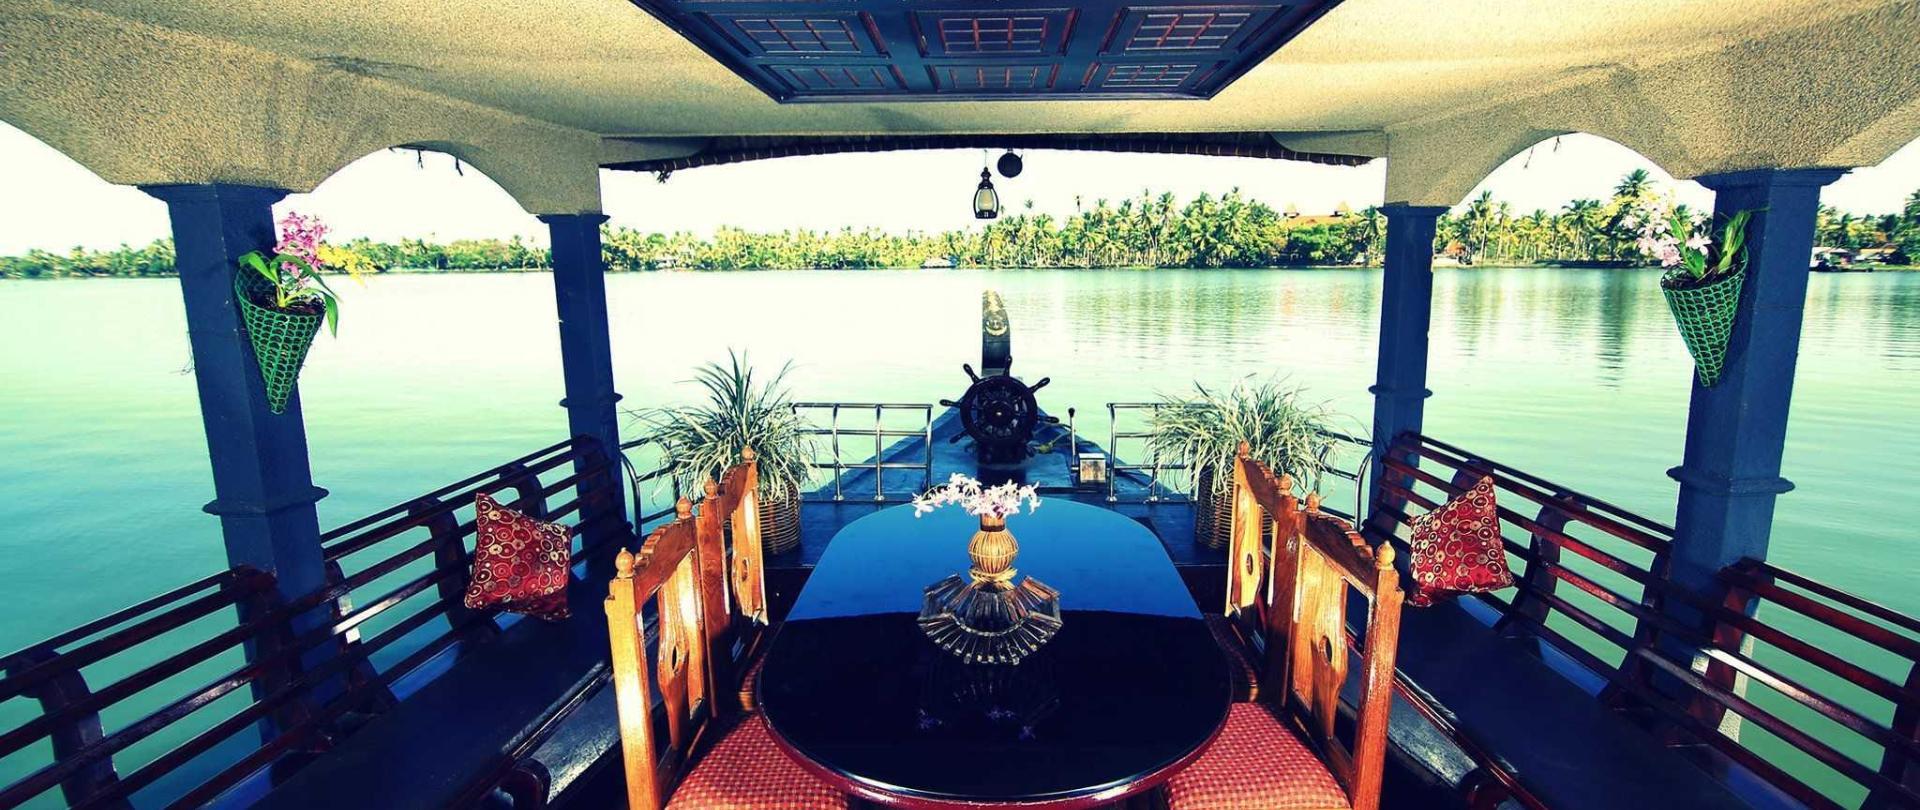 houseboat11111.jpg